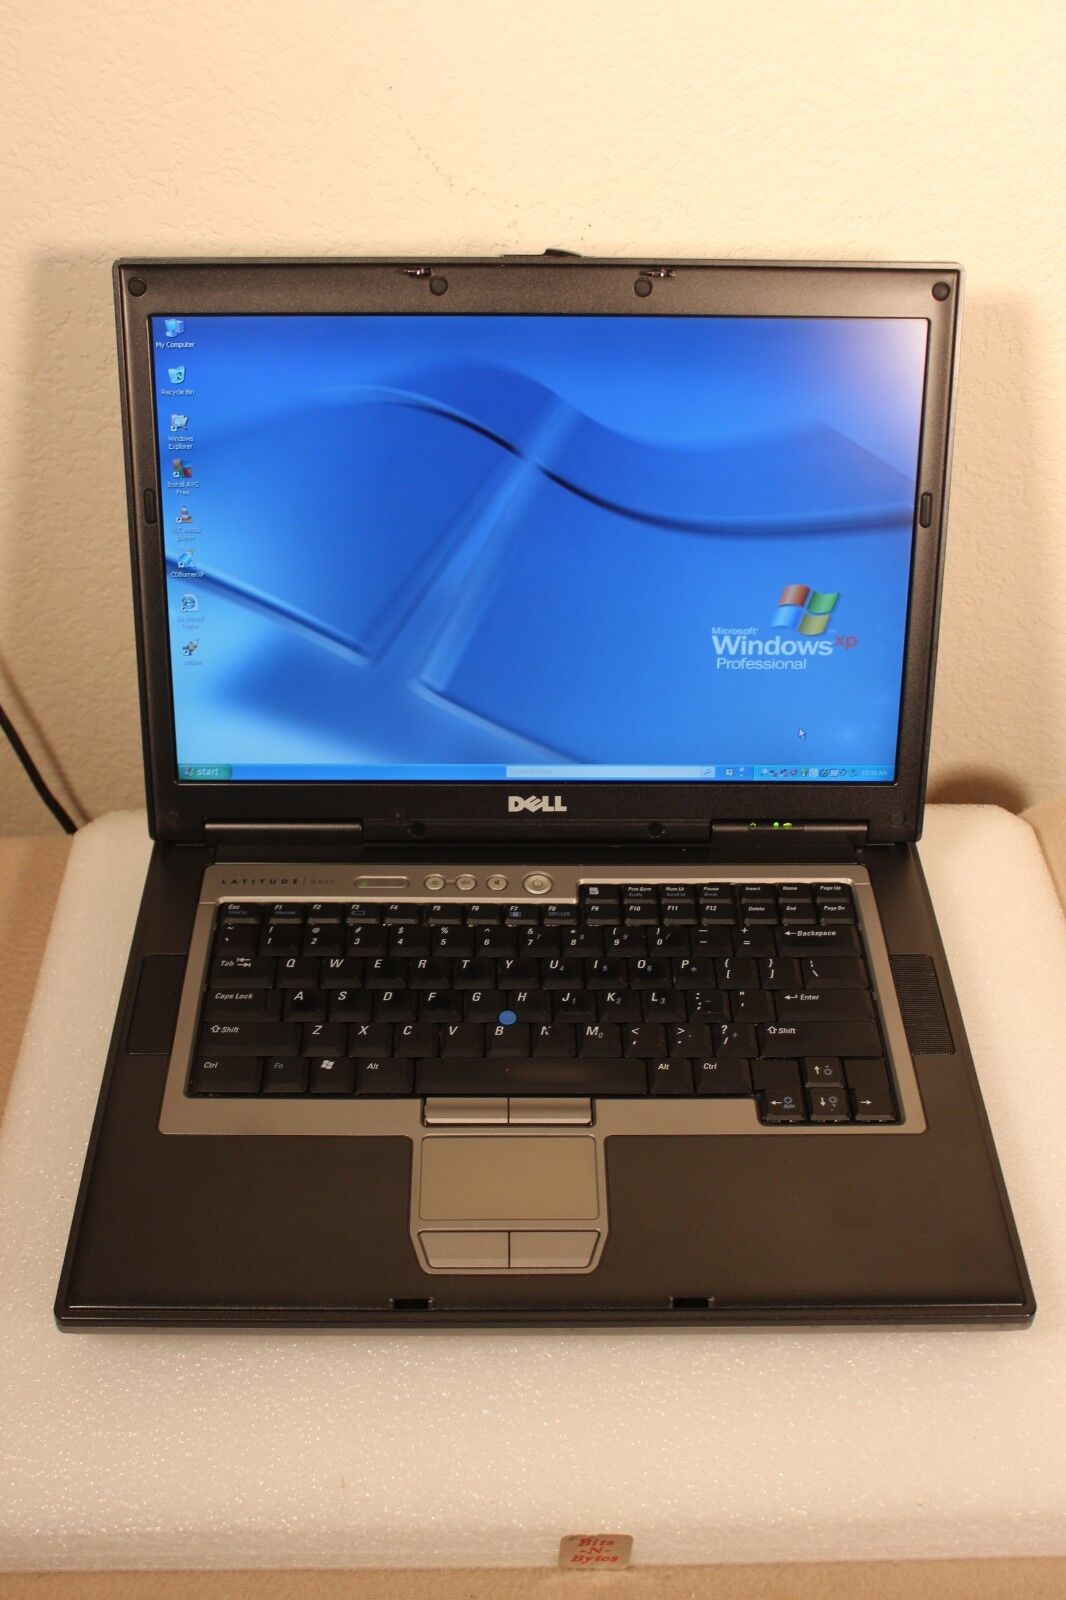 Dell Latitude D820 Notebook (1.83GHz/1.0GB/120GB/CDRWDVD) Windows XP PRO 19ZNMC1